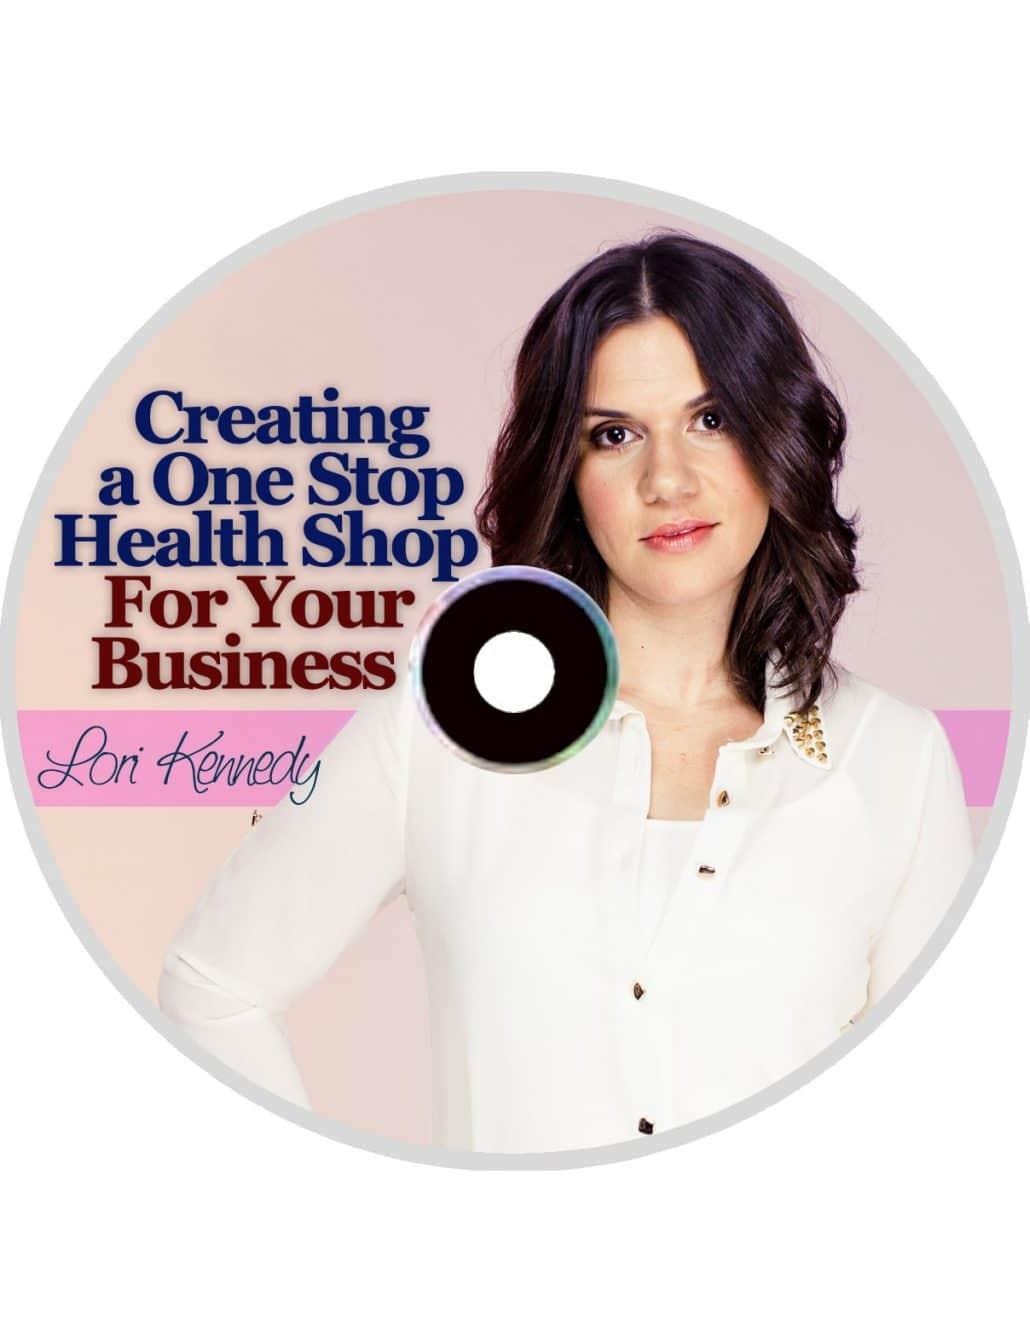 Lori-Kennedy-Creating-One-Stop-Health-Shop